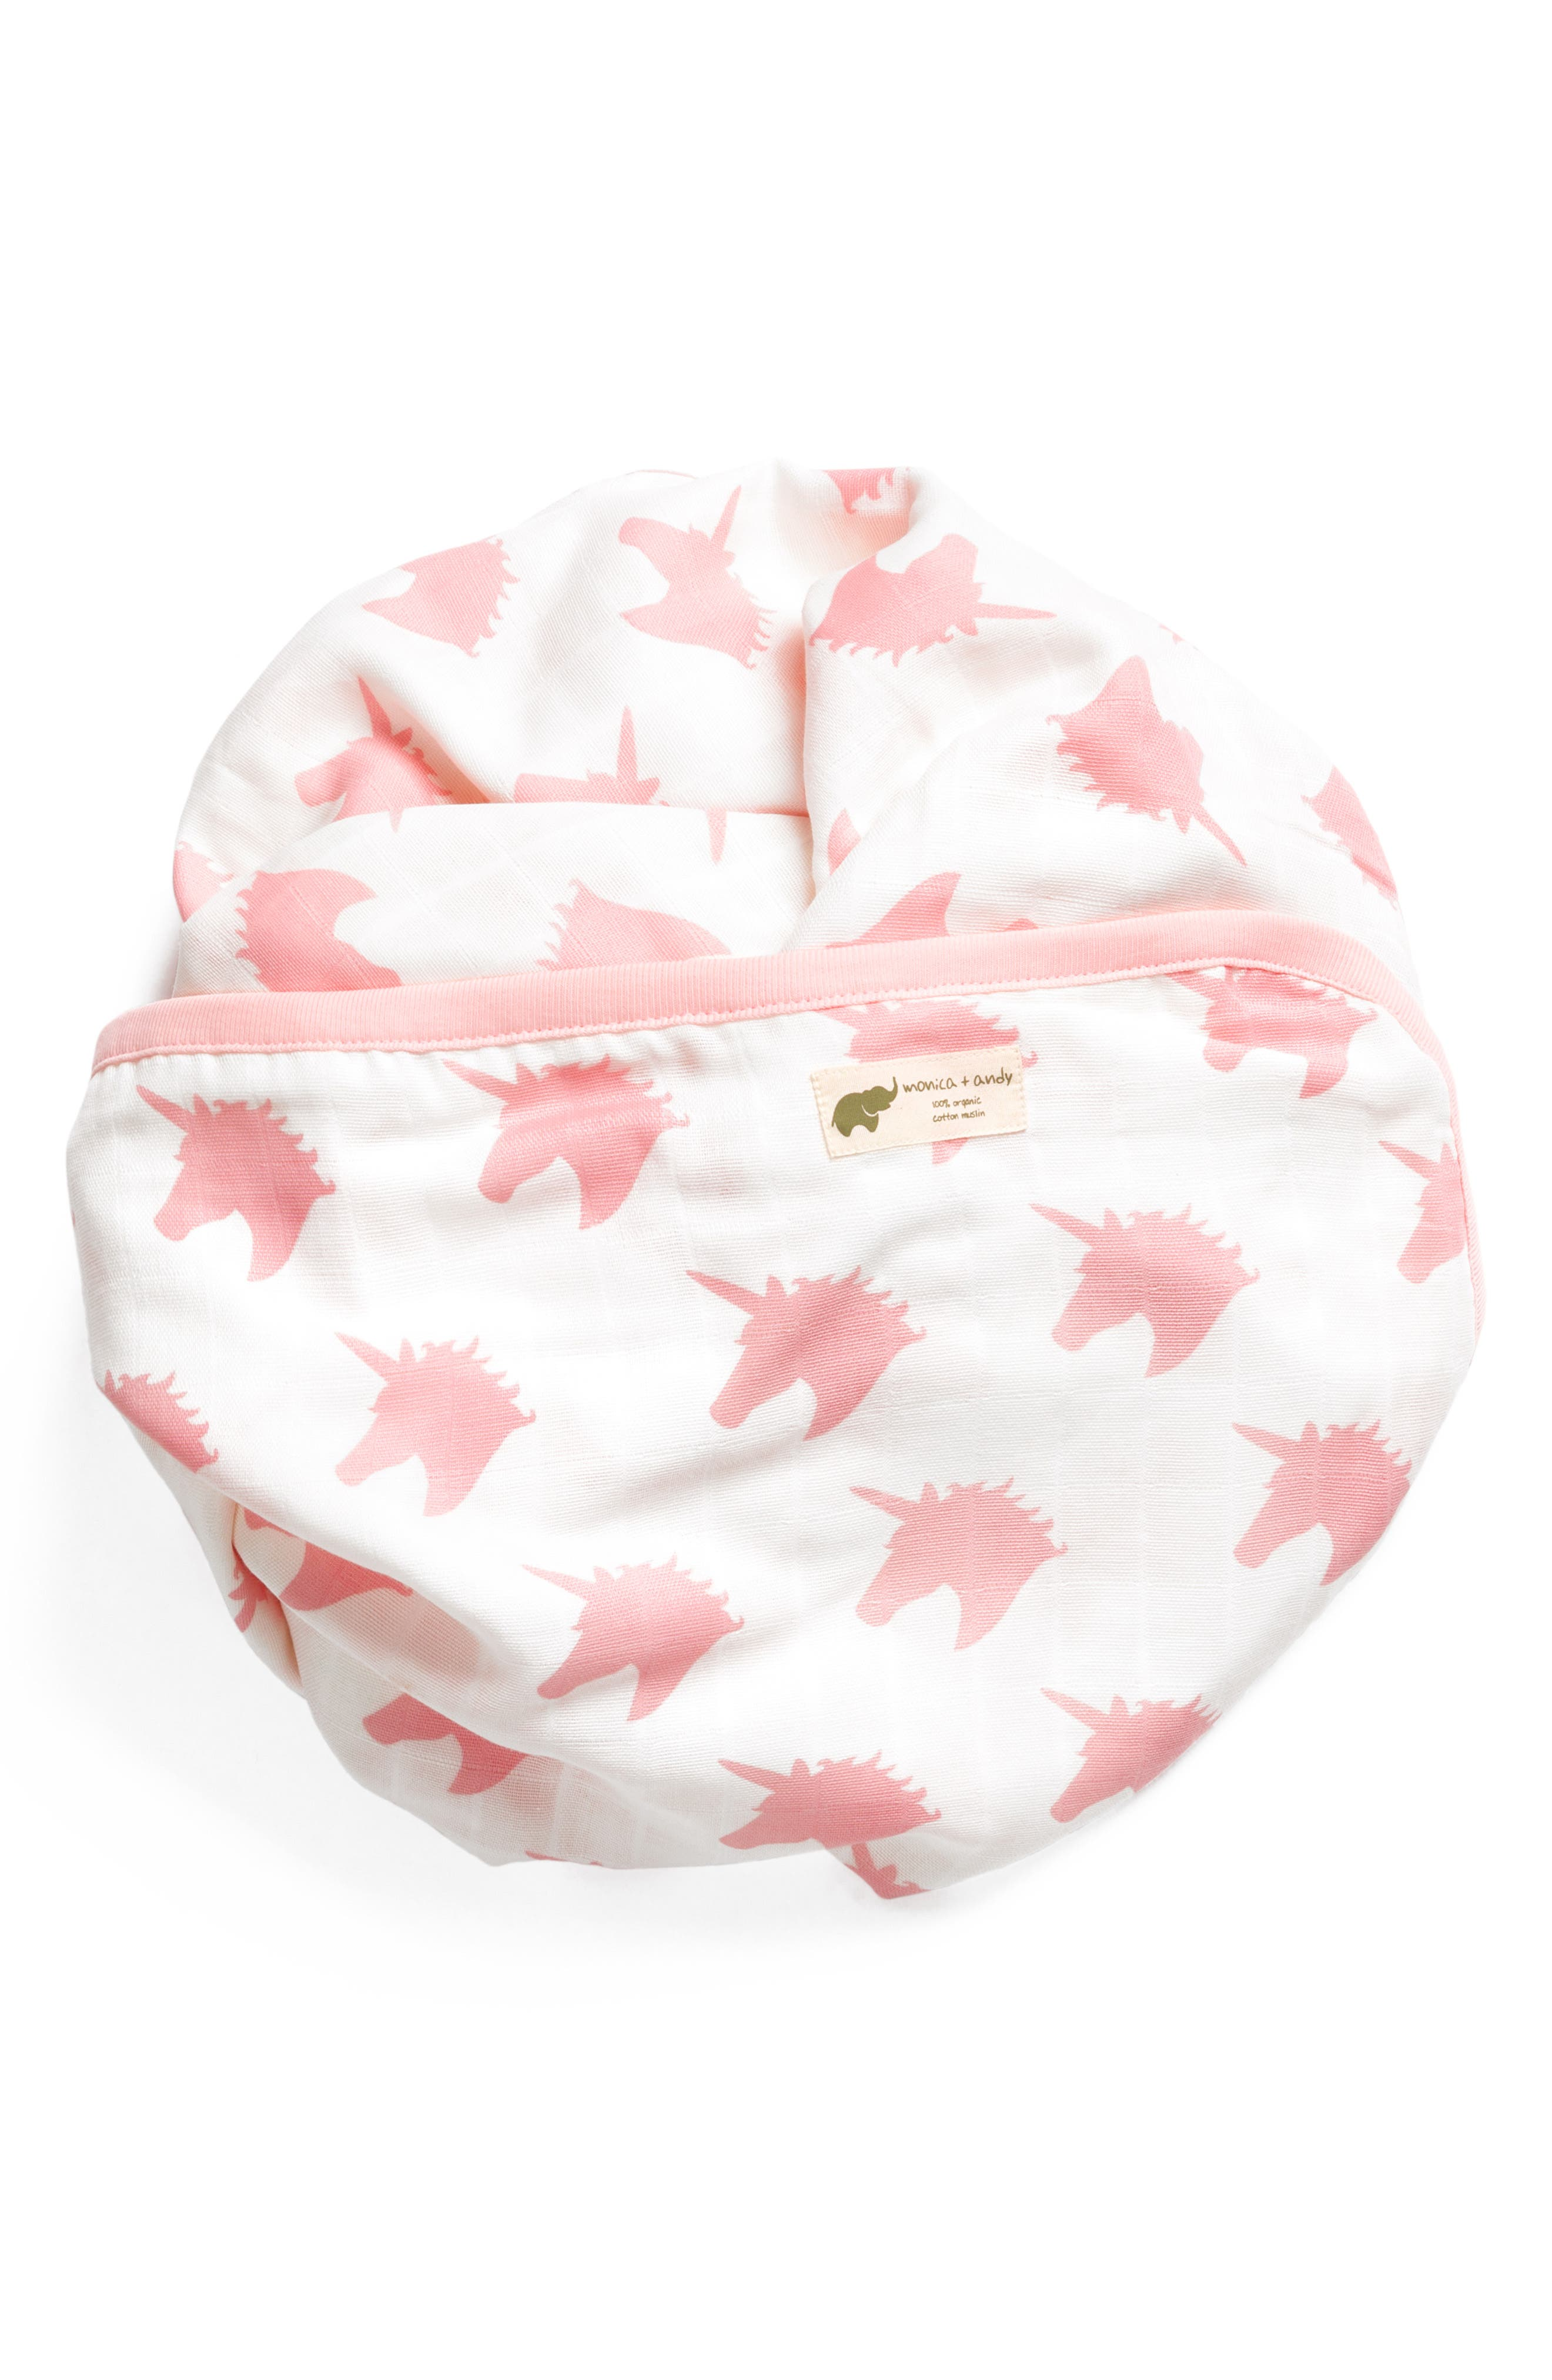 Believe in Unicorns Organic Cotton Always Blanket,                         Main,                         color, BELIEVE IN UNICORNS